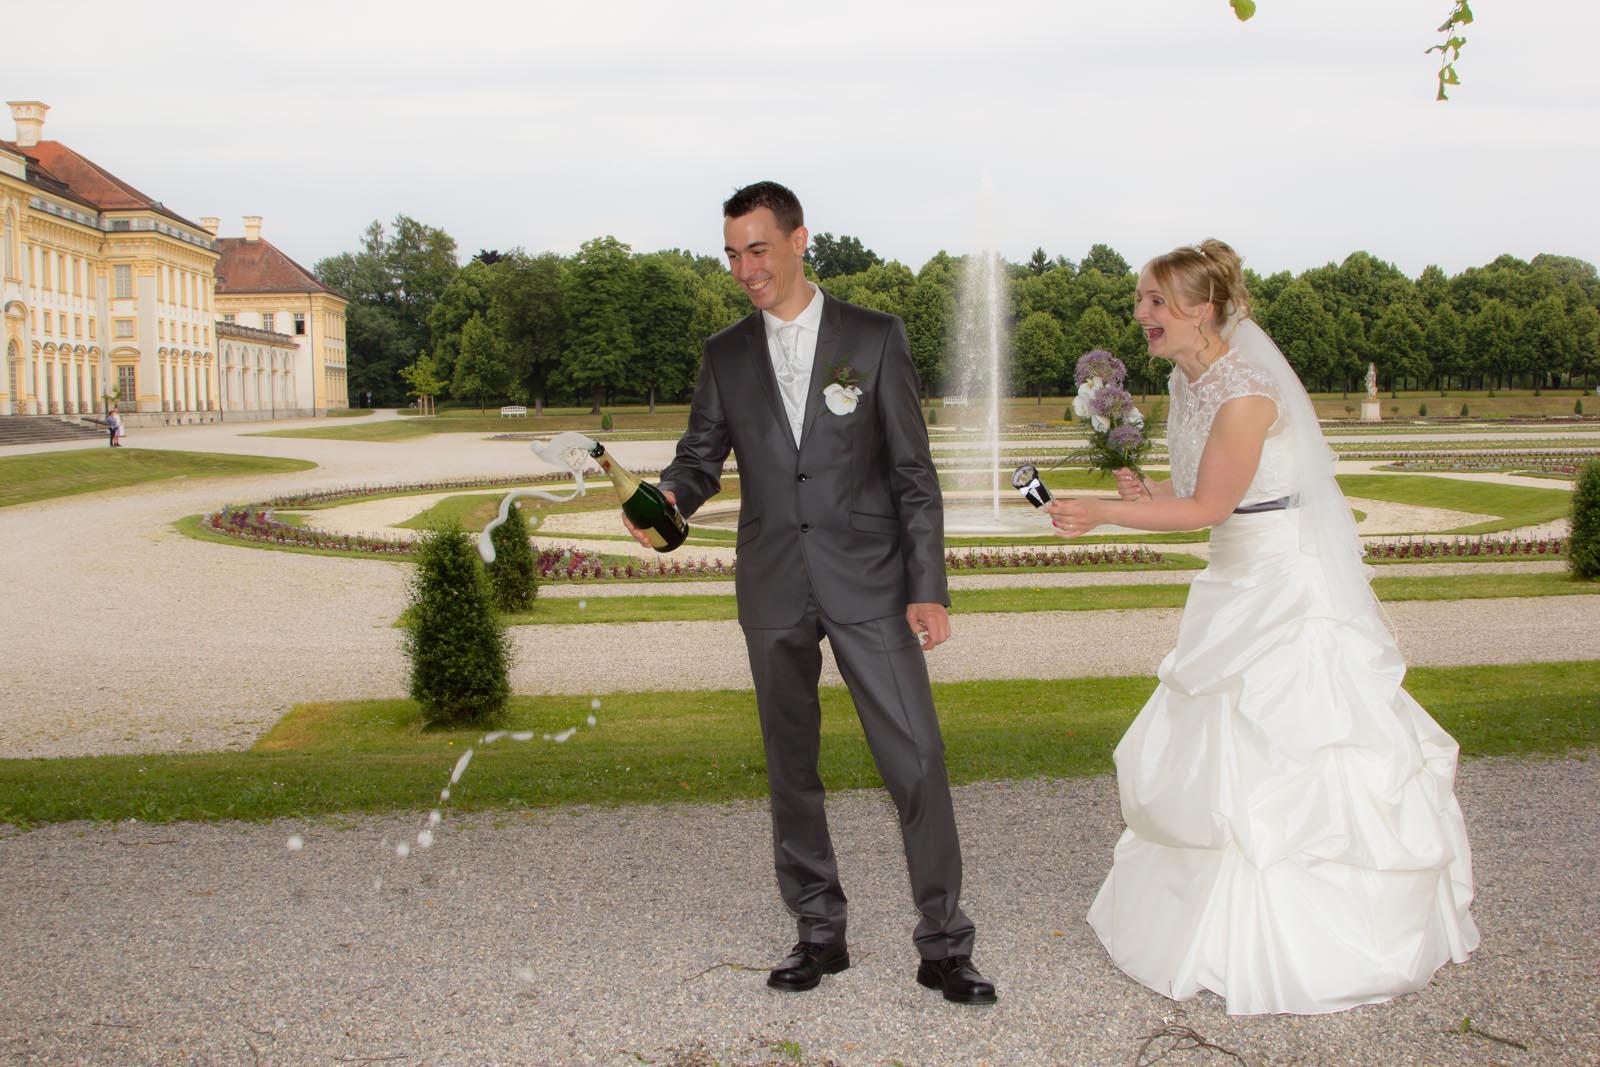 Hochzeit-Portraits-Jacob-Kirche-Hochzeit-Jacob-7092.jpg